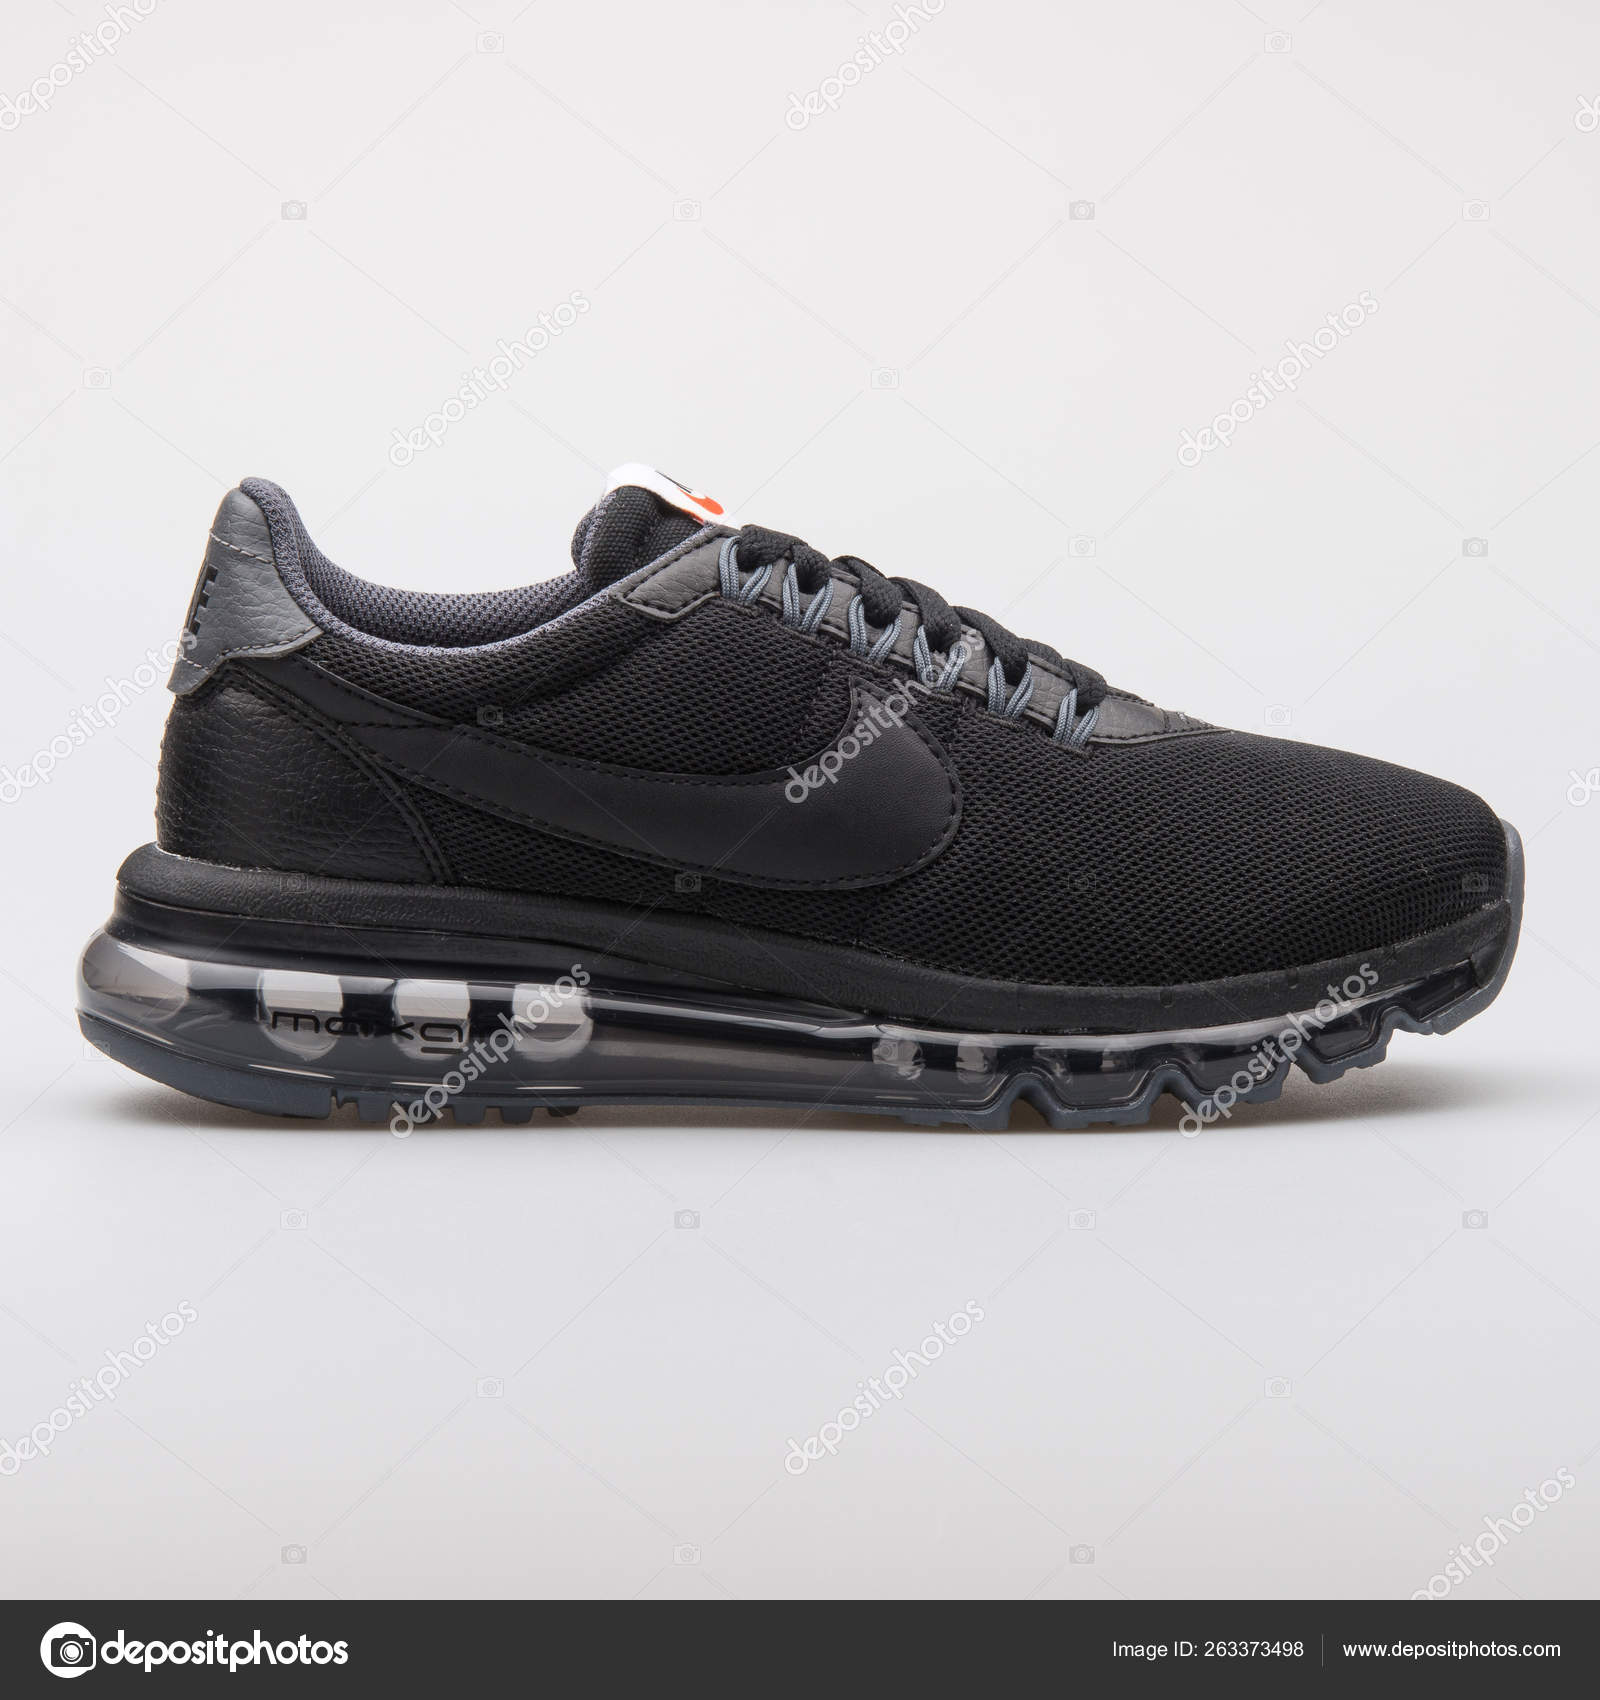 matar Aplicable Positivo  Nike Air Max LD Zero black sneaker – Stock Editorial Photo © xMarshallfilms  #263373498